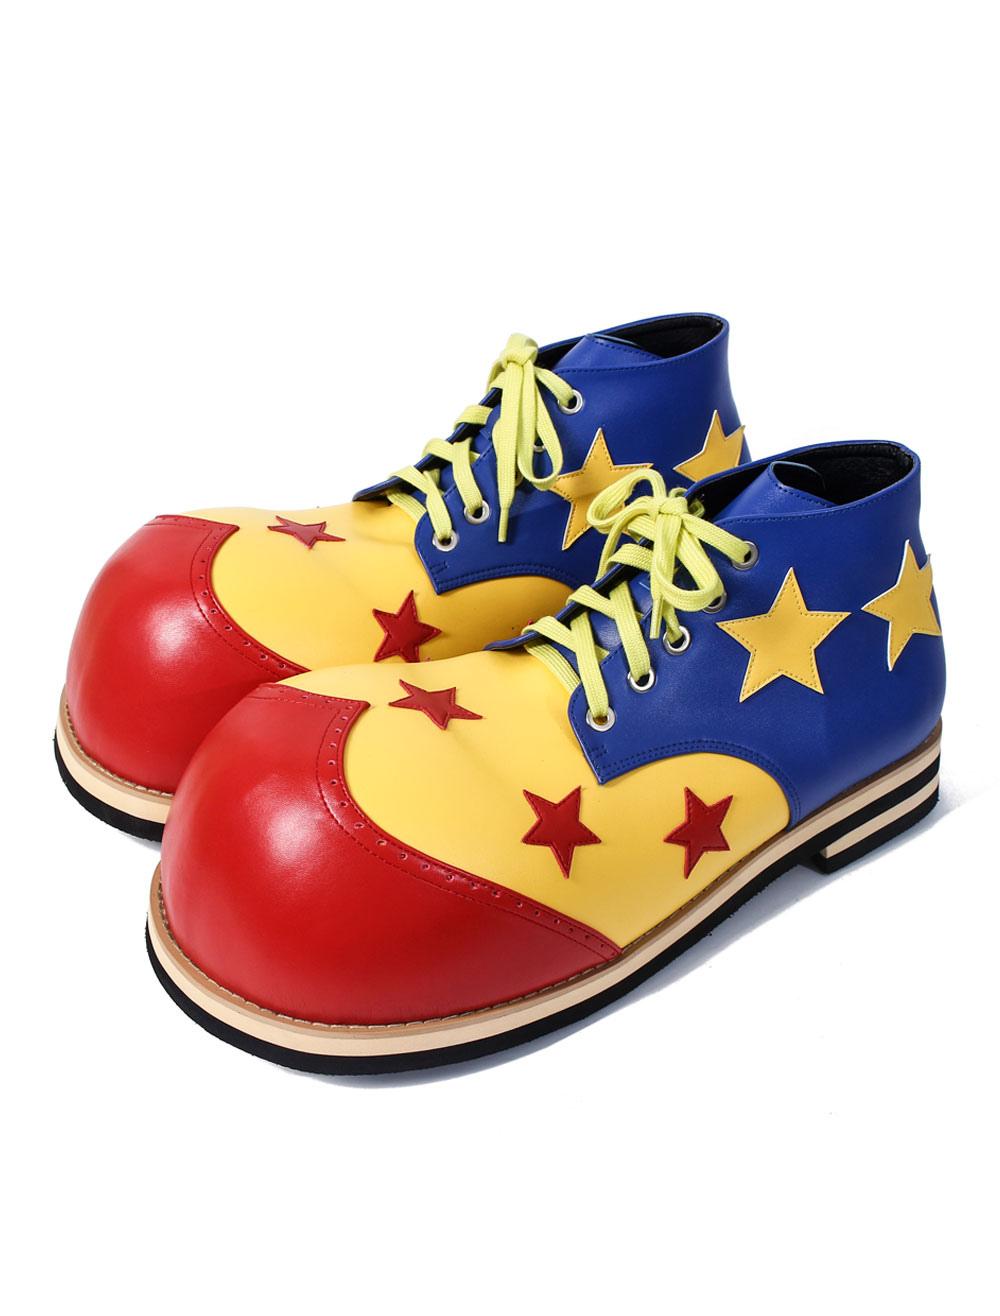 Anime Halloween Funny Clown Joker Cosplay Shoes